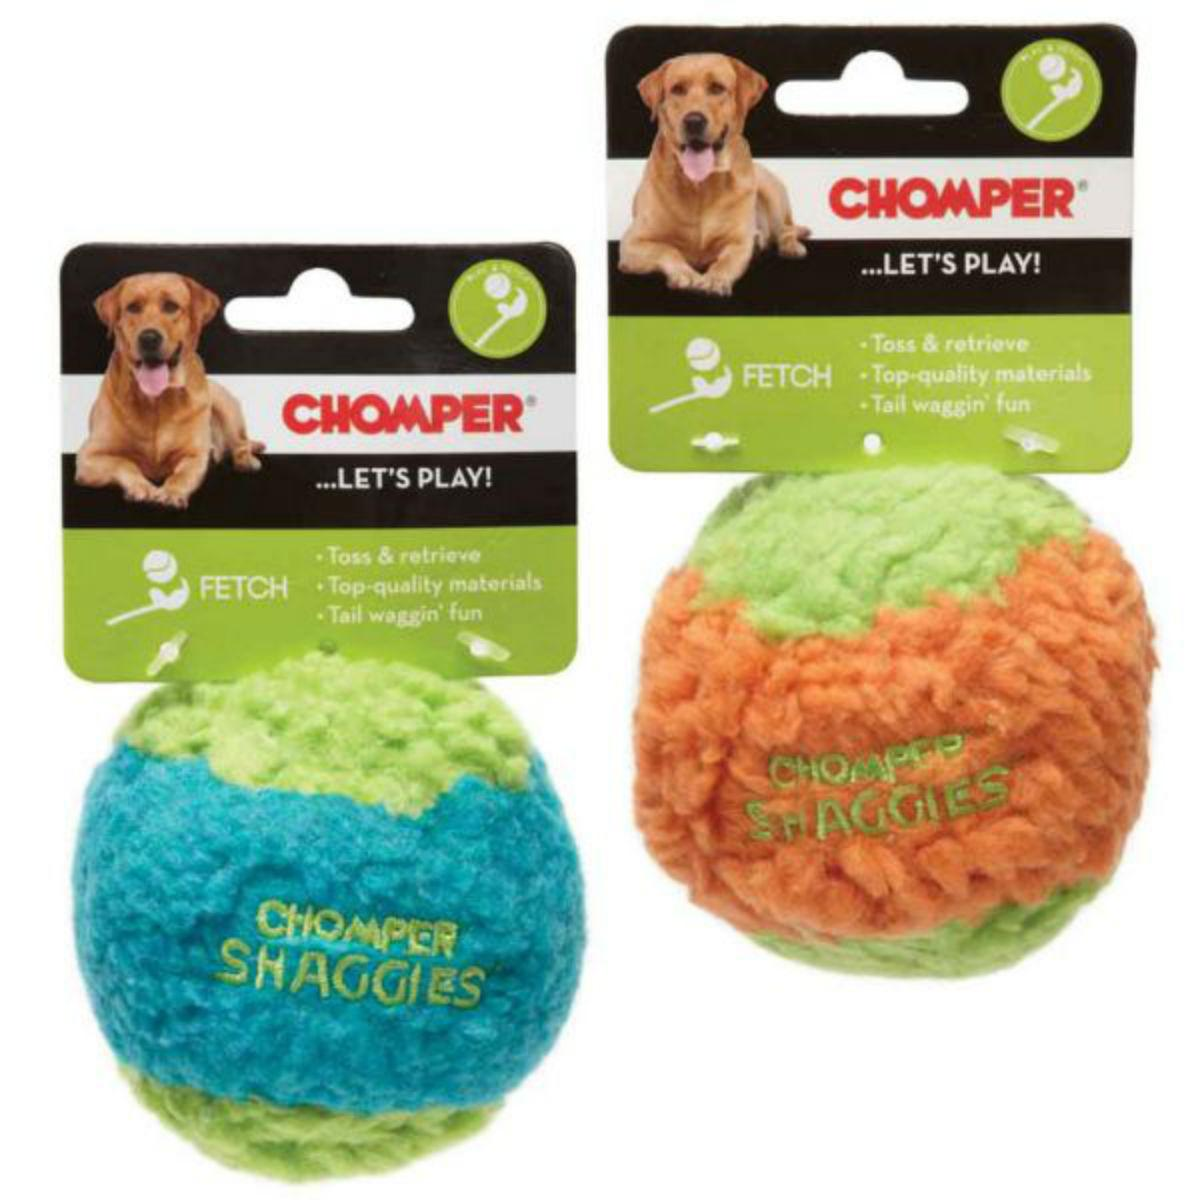 Chomper Shaggies Rubber Squeaker Ball Dog Toy